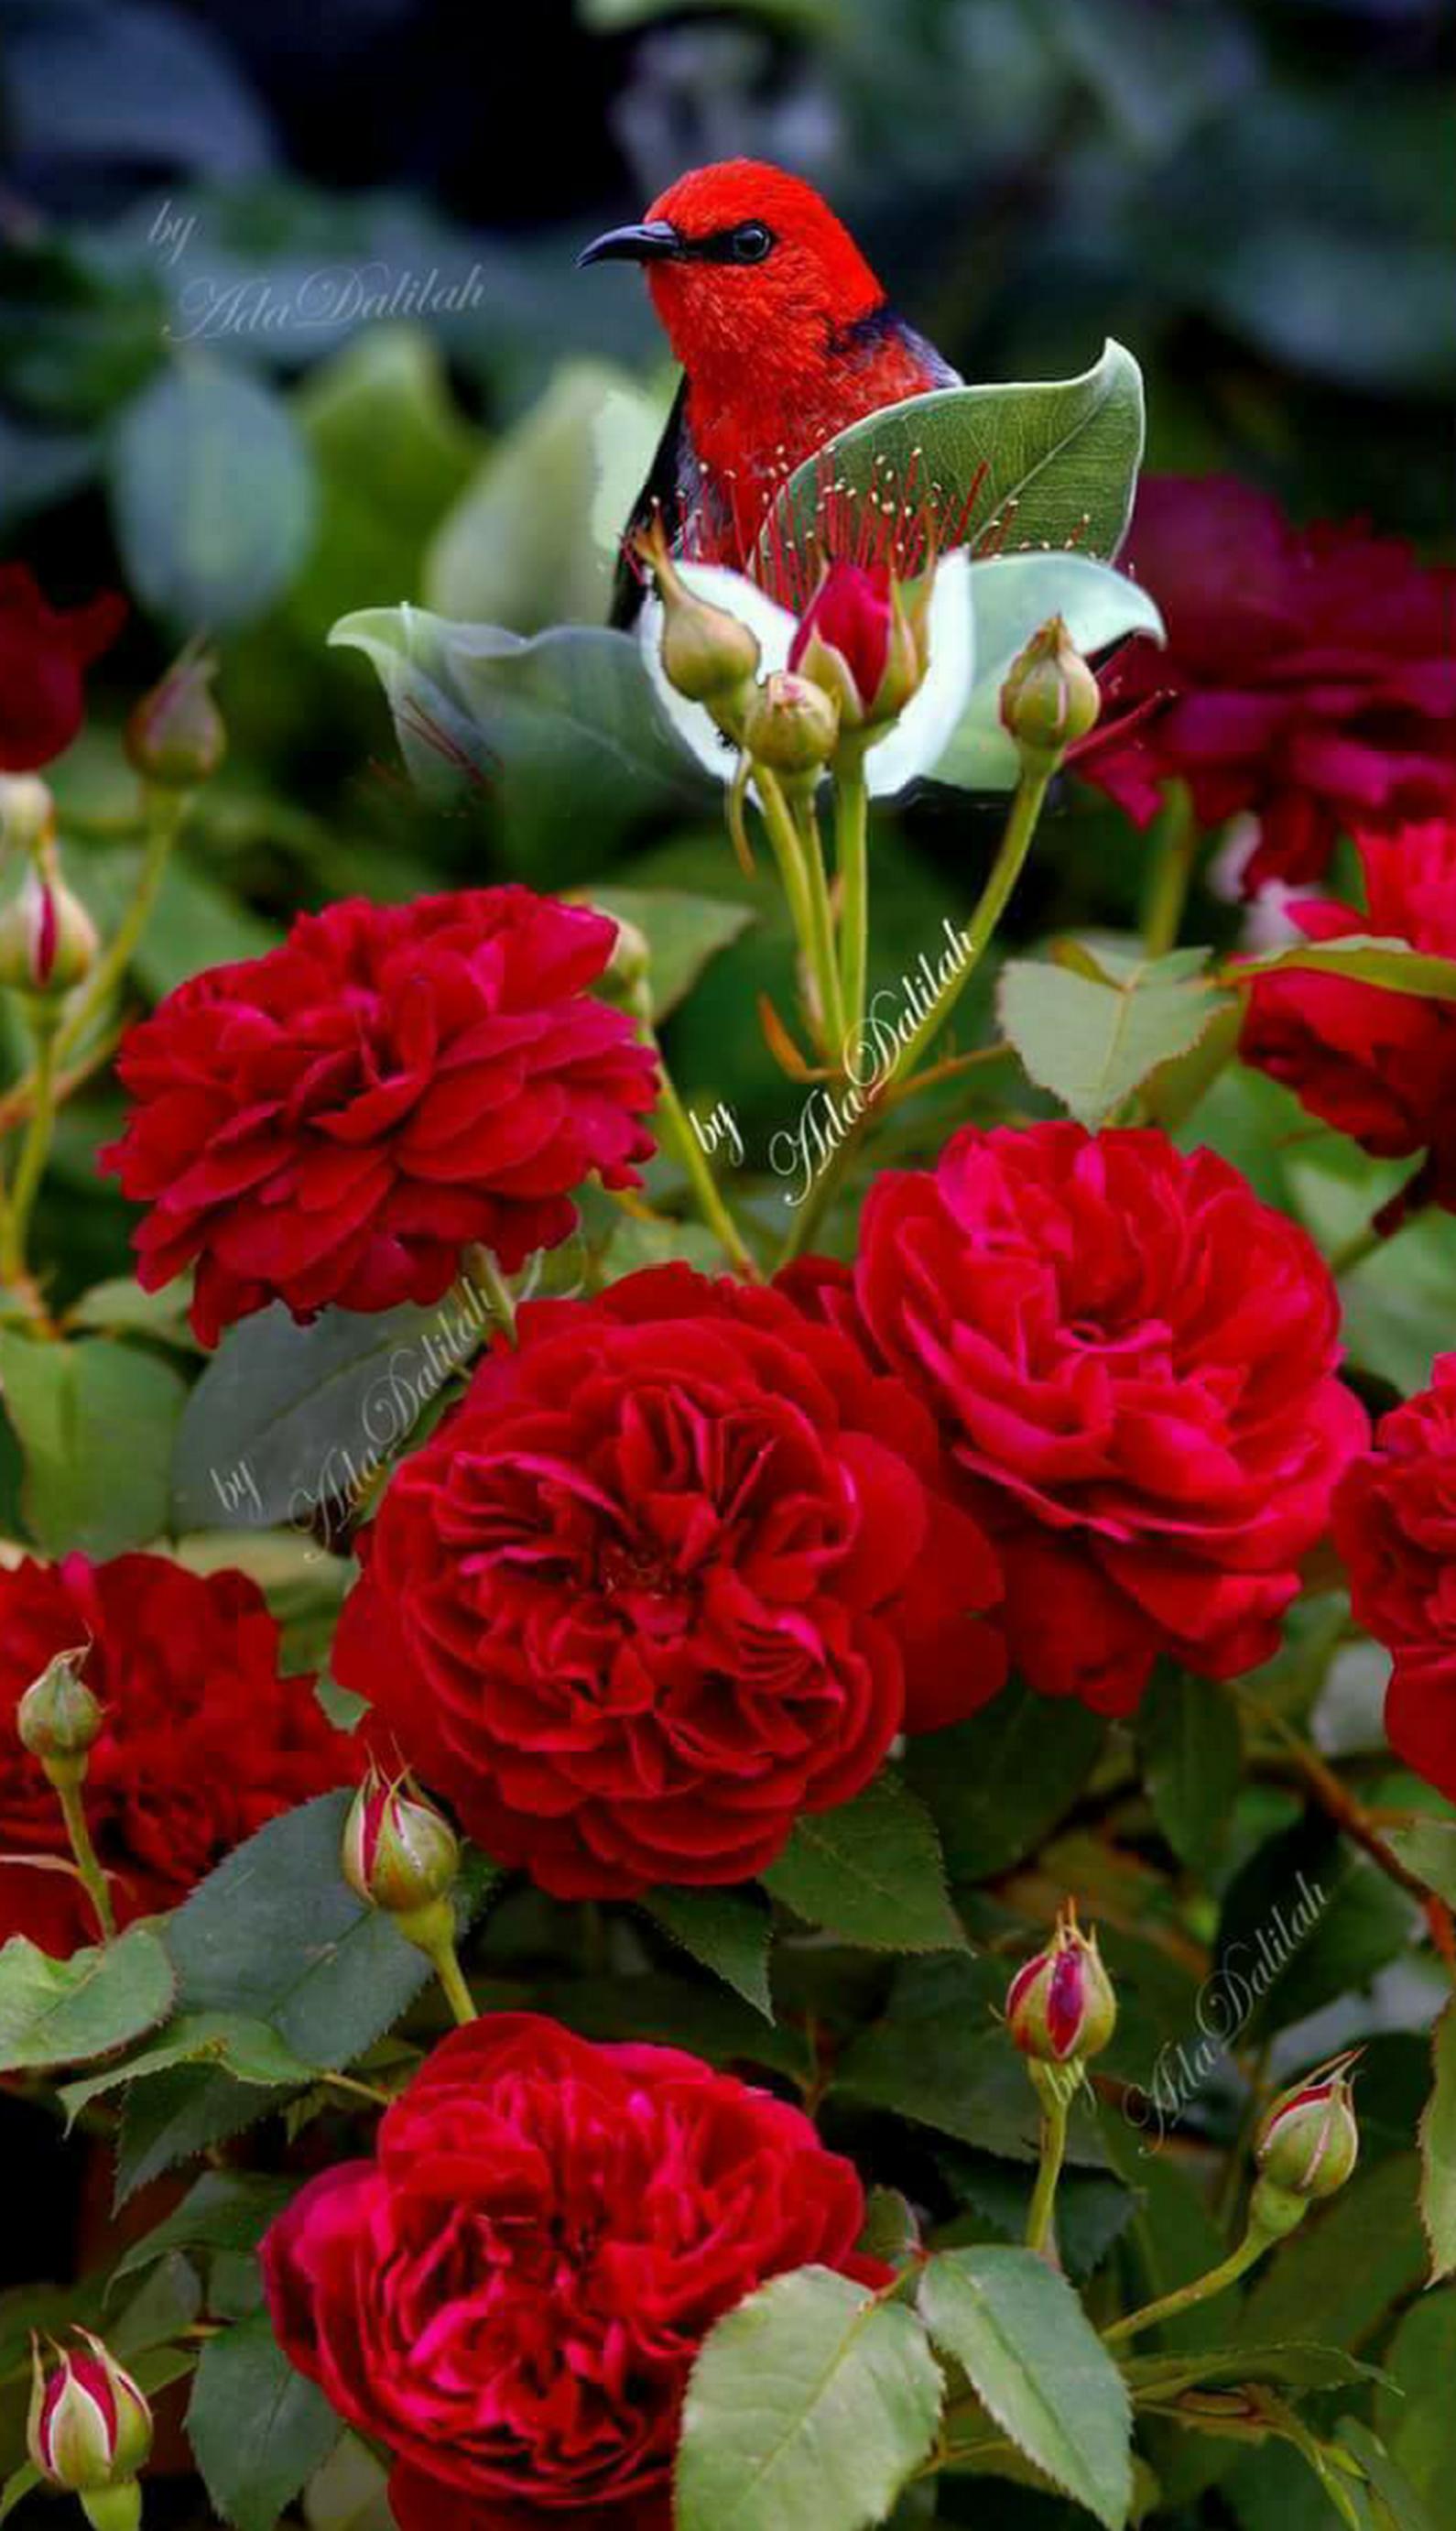 Pin By K Kloberdans On Hidden In 2020 Beautiful Rose Flowers Flying Flowers Beautiful Red Roses